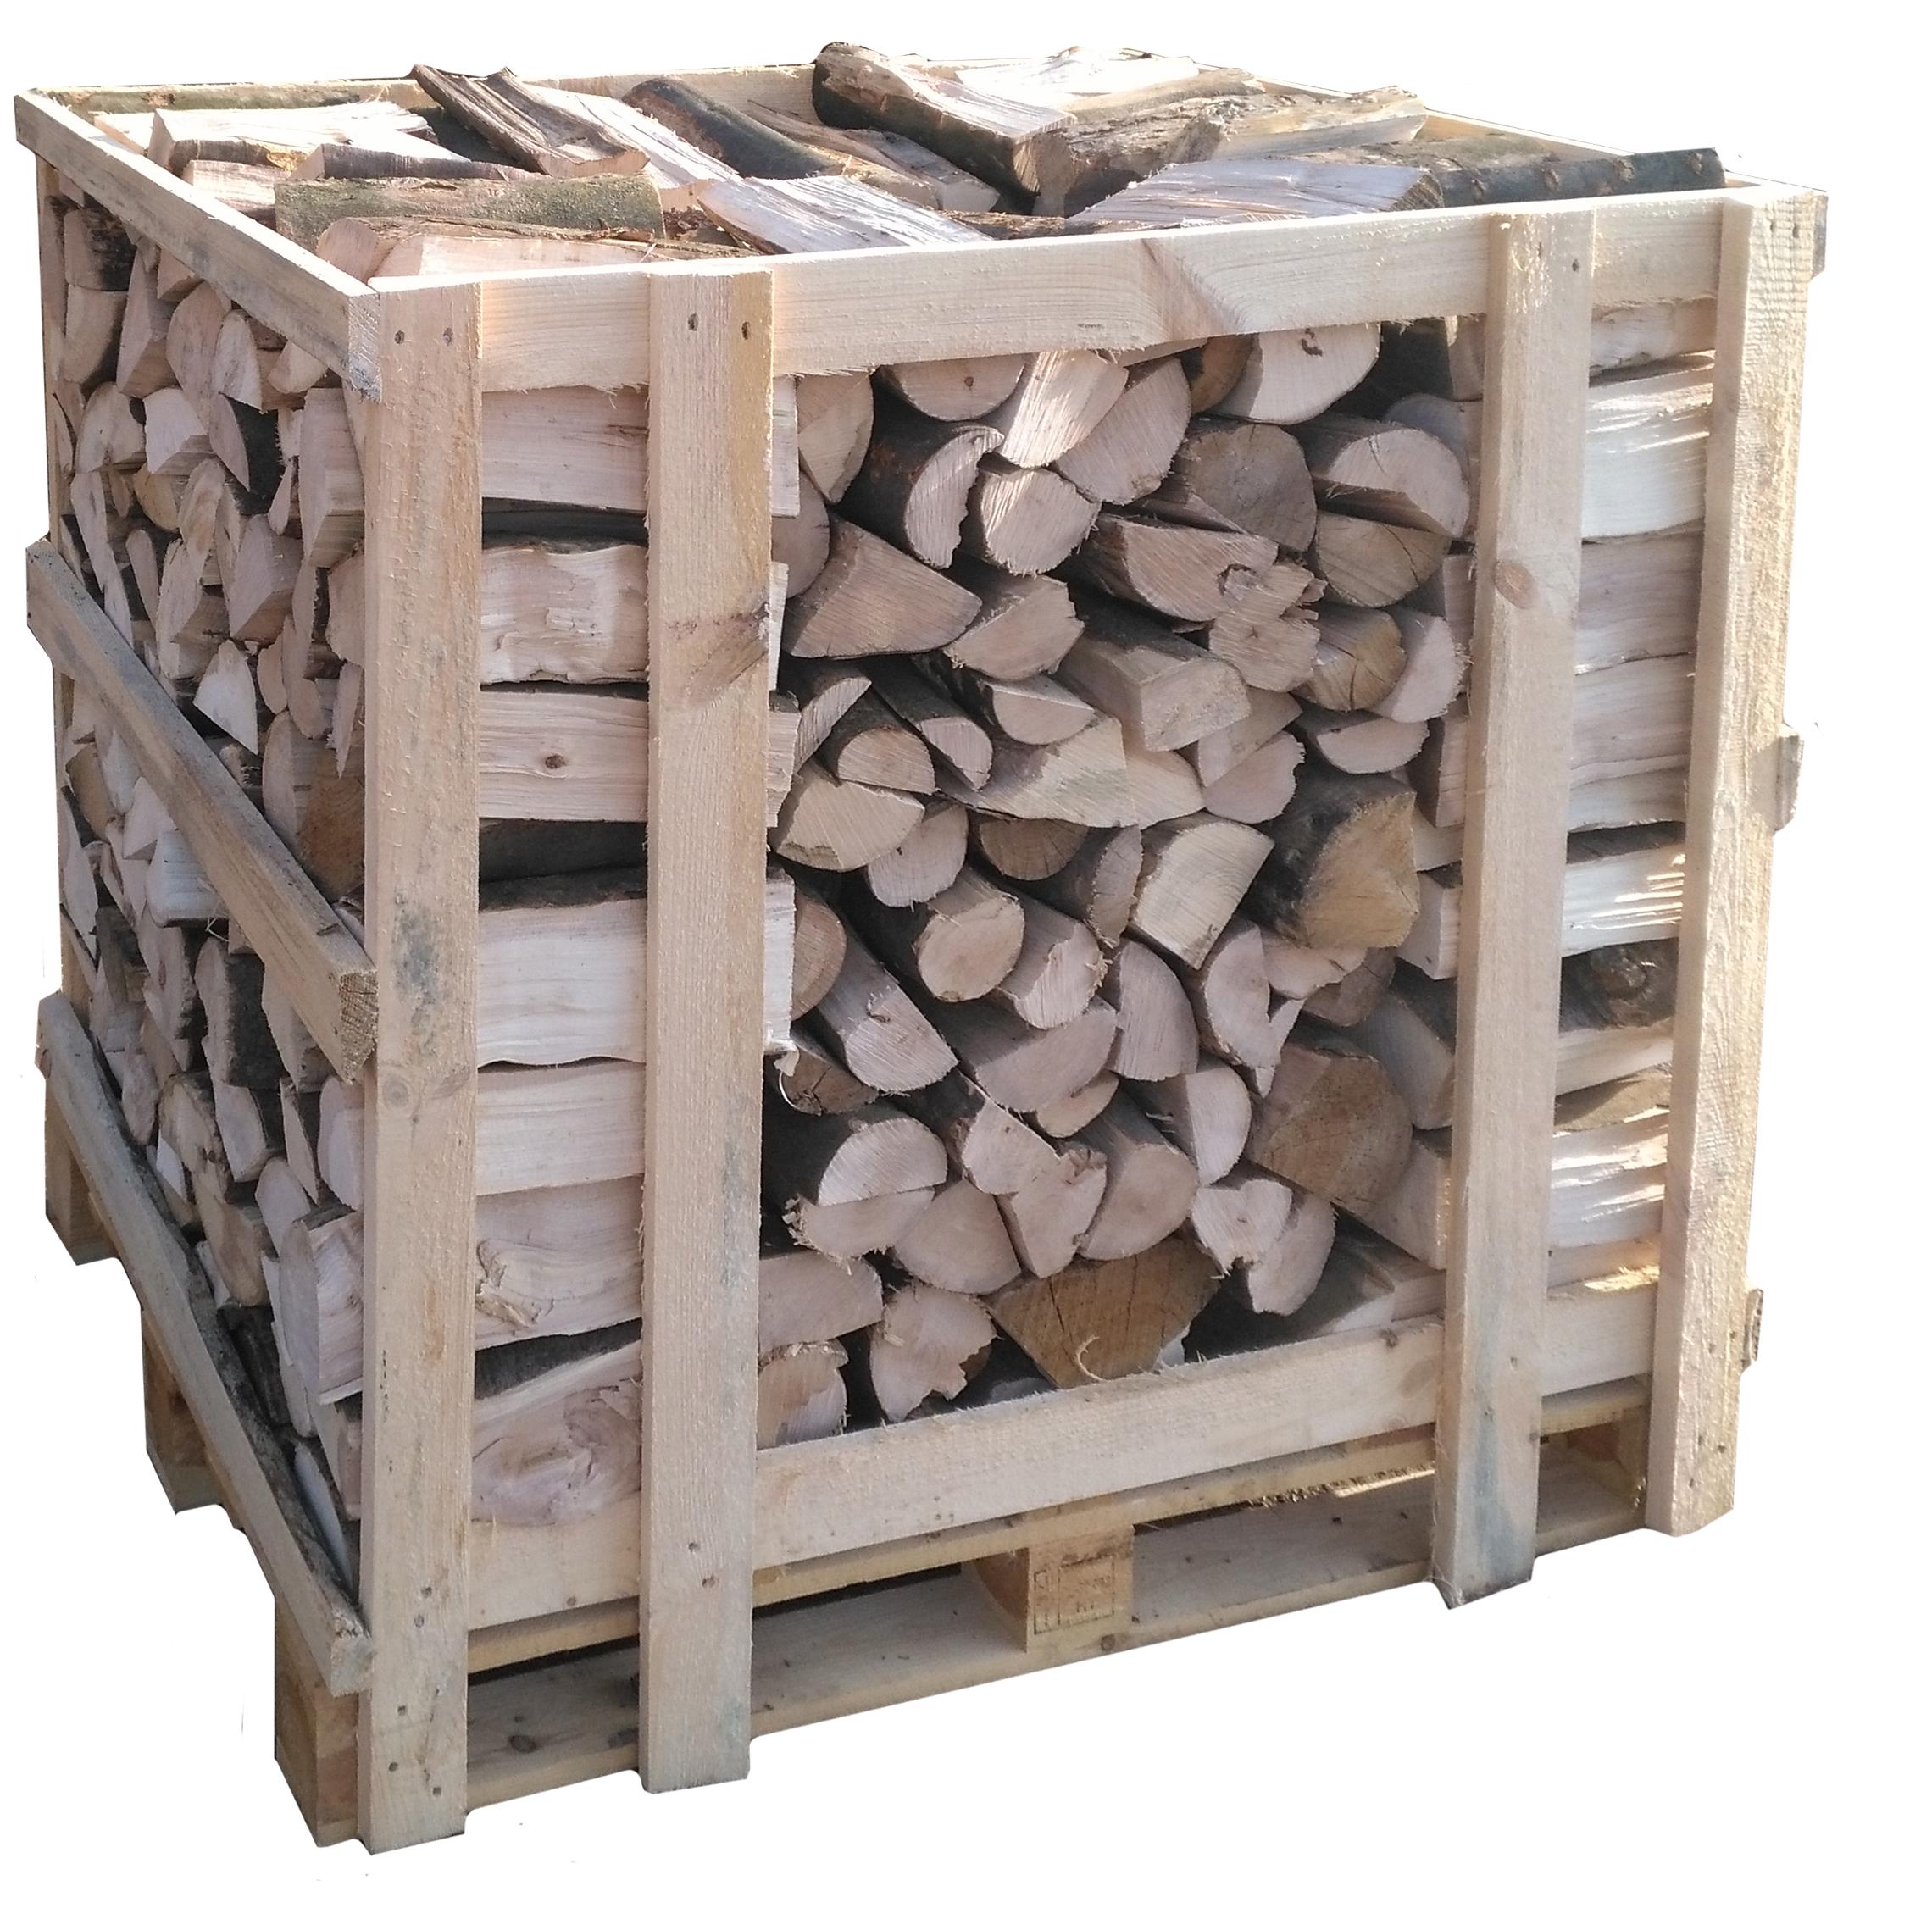 Drewno export, Skrzynio-Paleta 1mp